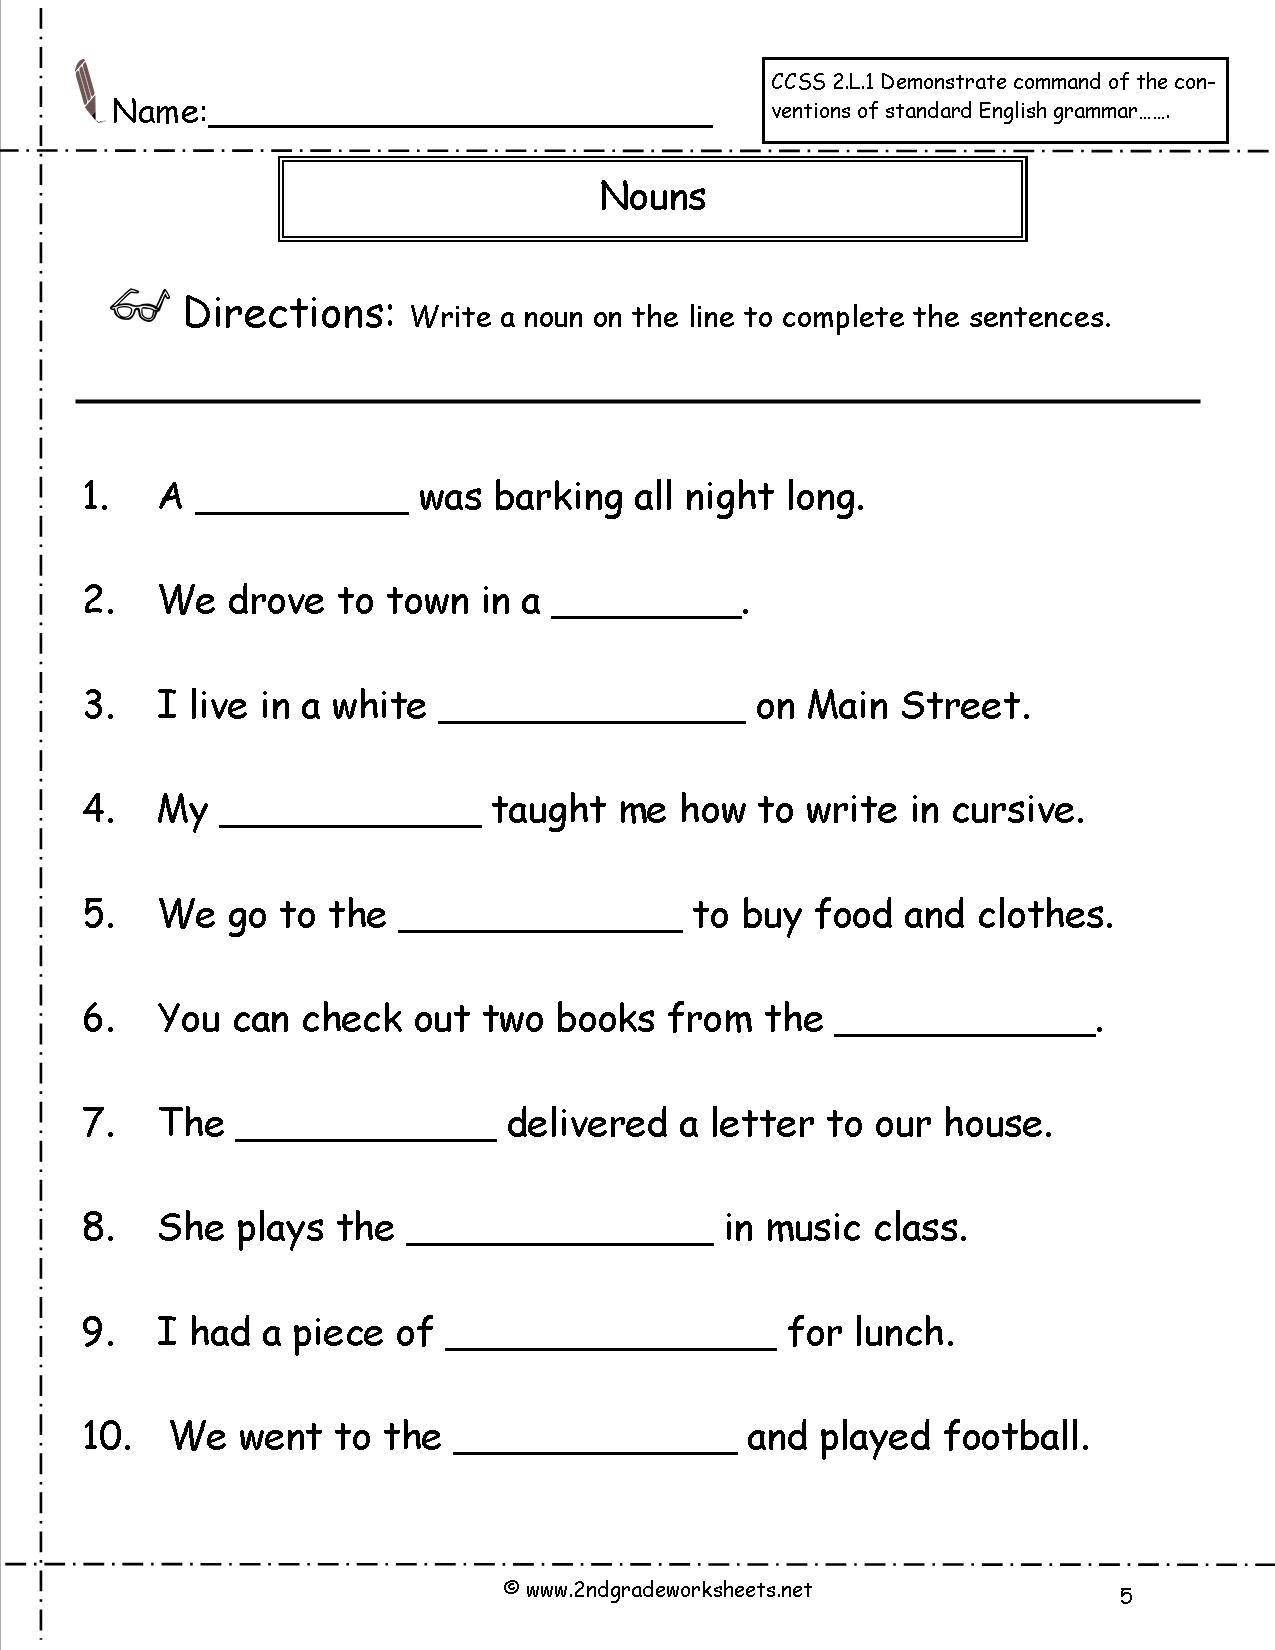 15 Best Noun Worksheets For 4th Grade Images On Best